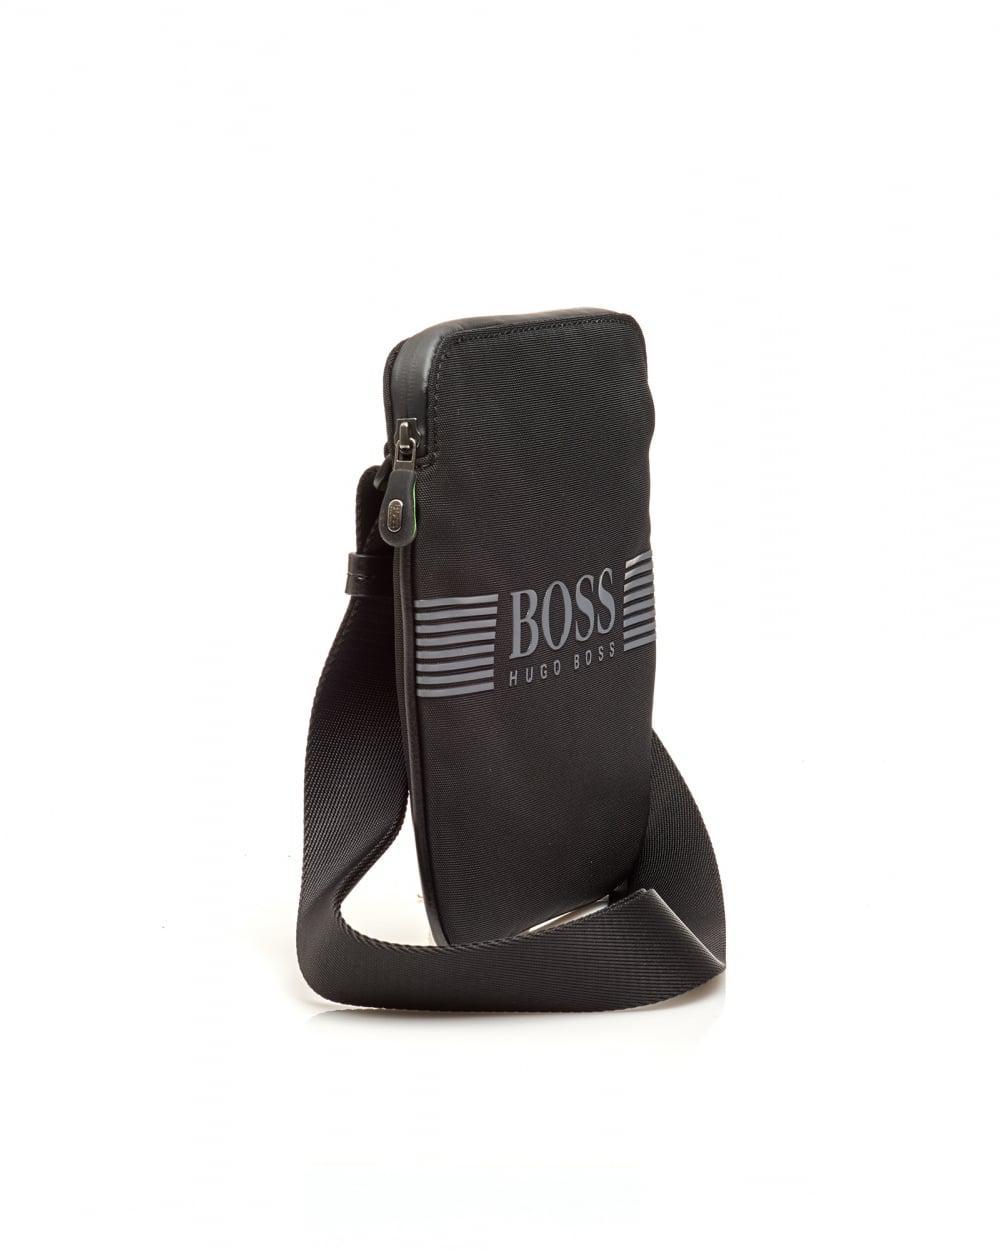 bd3ba47718 BOSS Pixel_s Zip Env Nylon Stash Crossbody Black Bag in Black for Men - Lyst